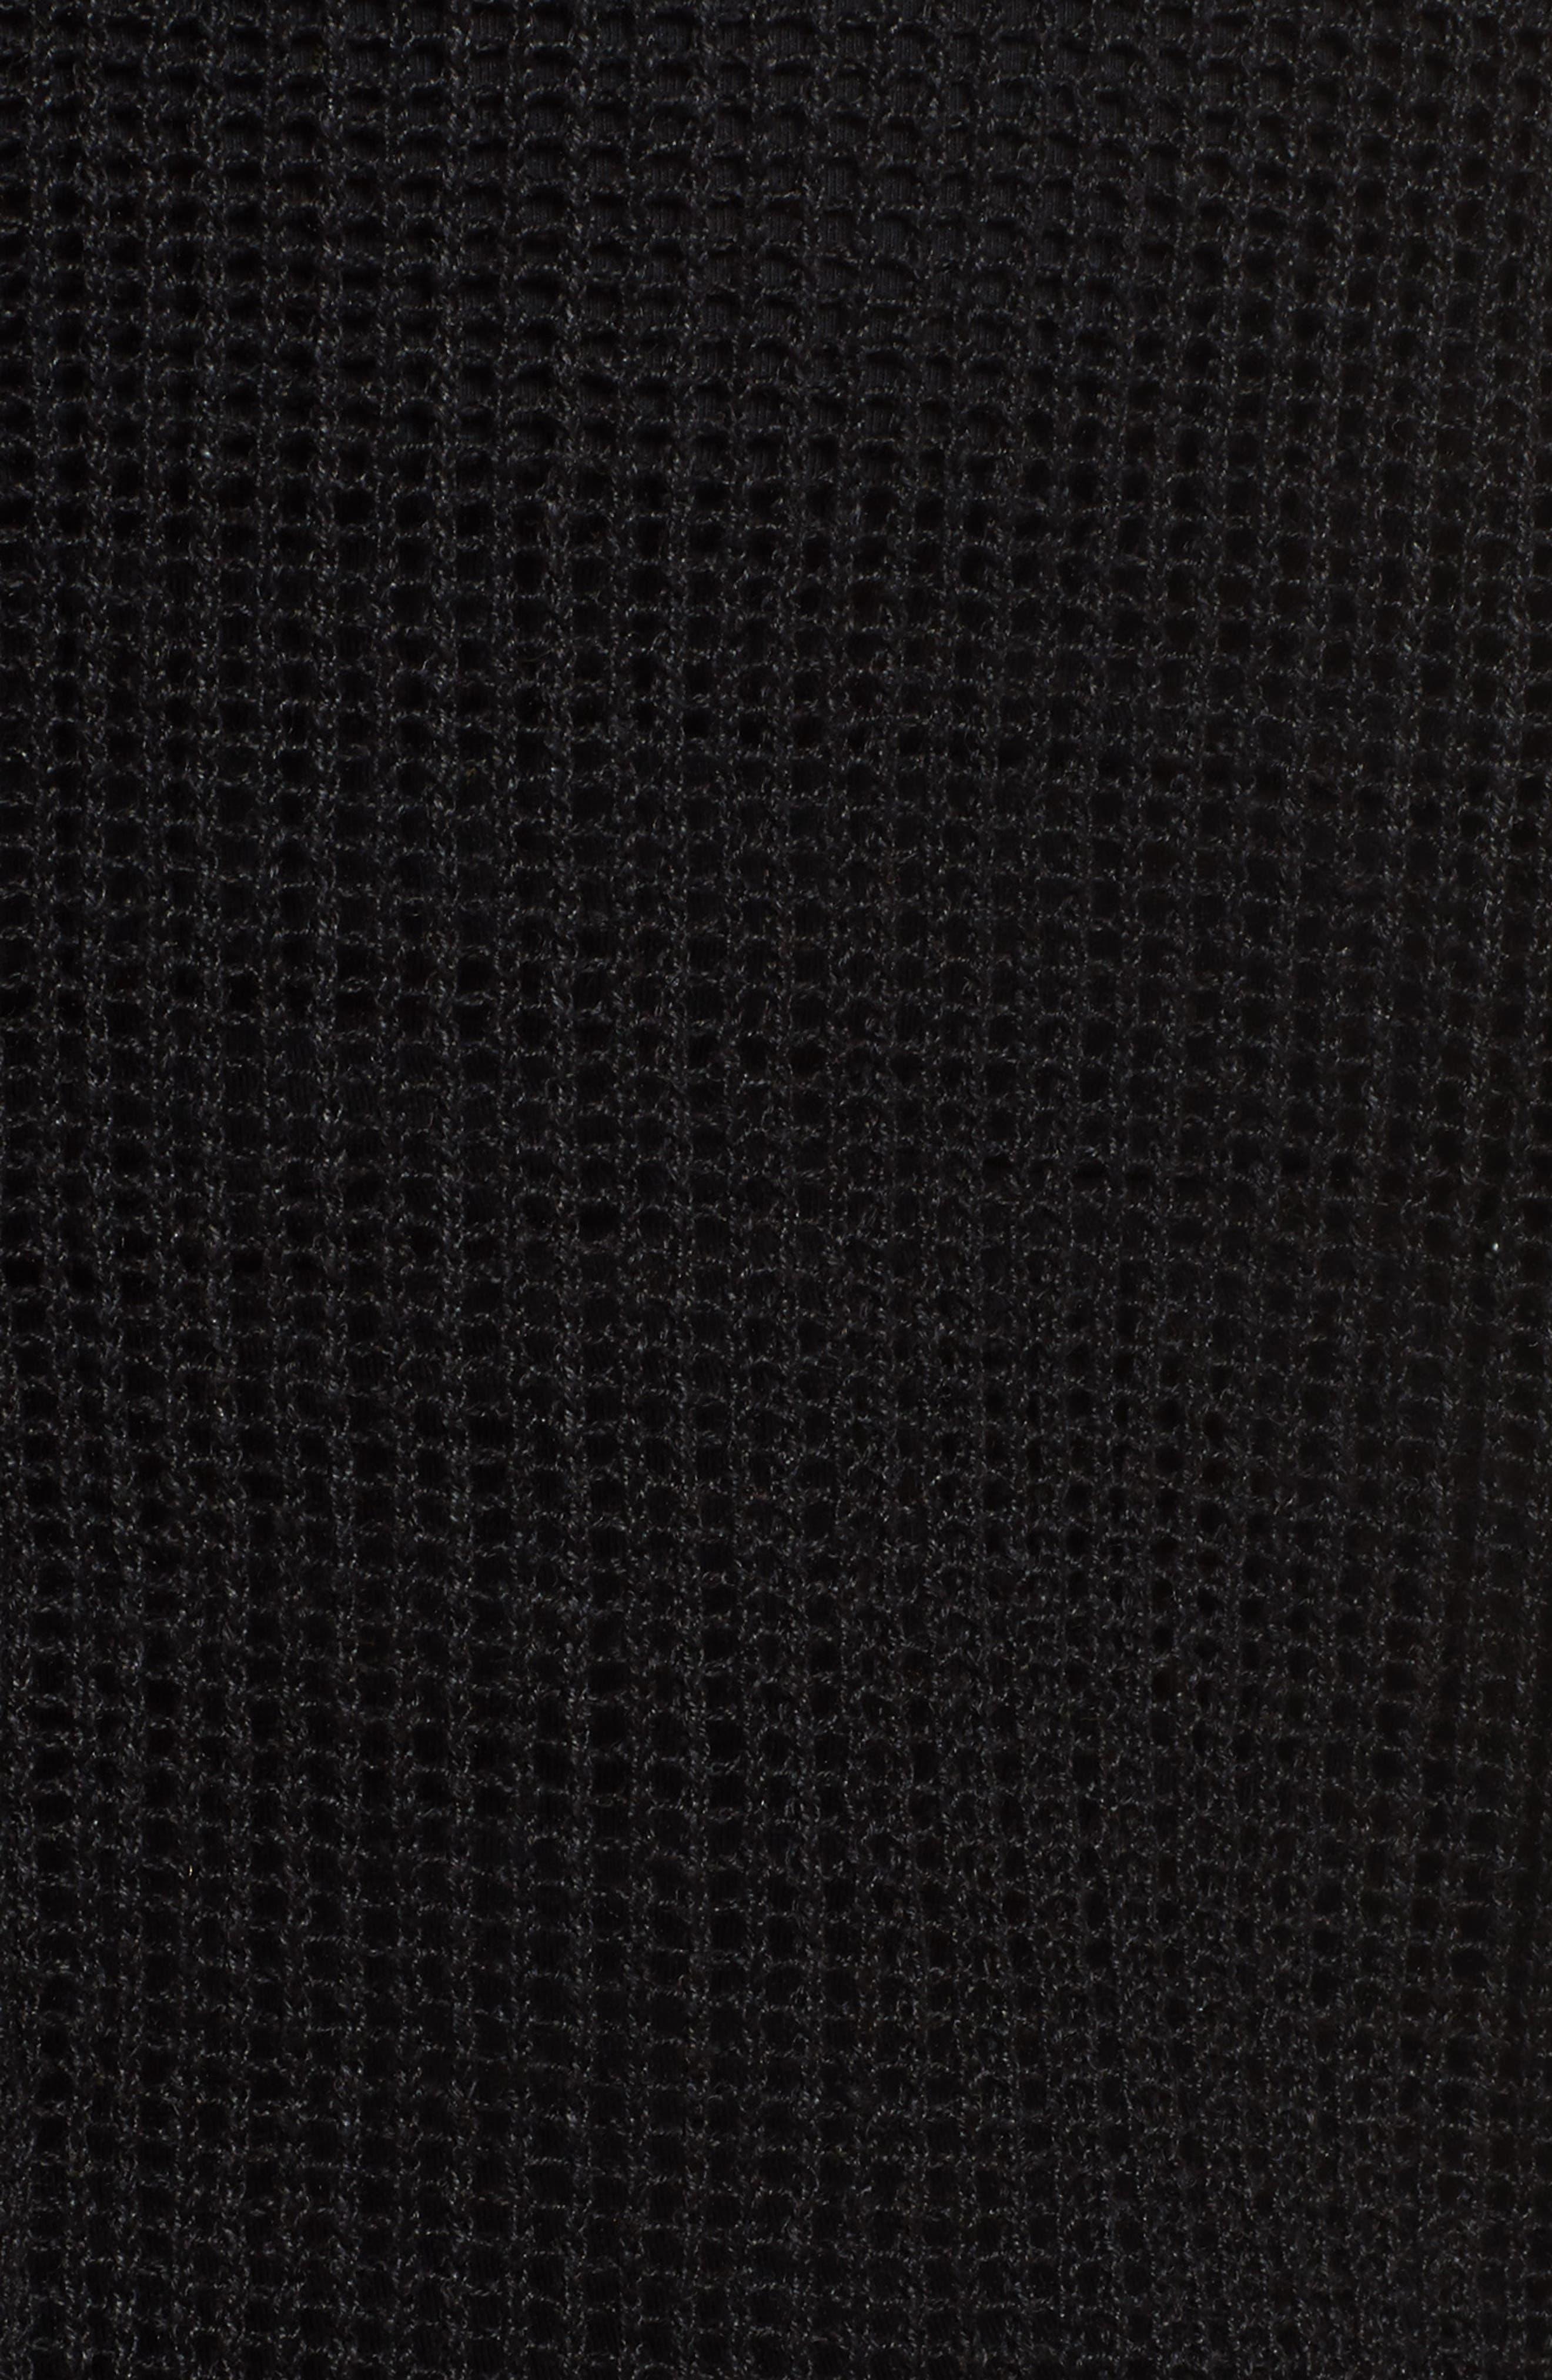 EILEEN FISHER, Organic Linen Mesh Knit Top, Alternate thumbnail 5, color, 001